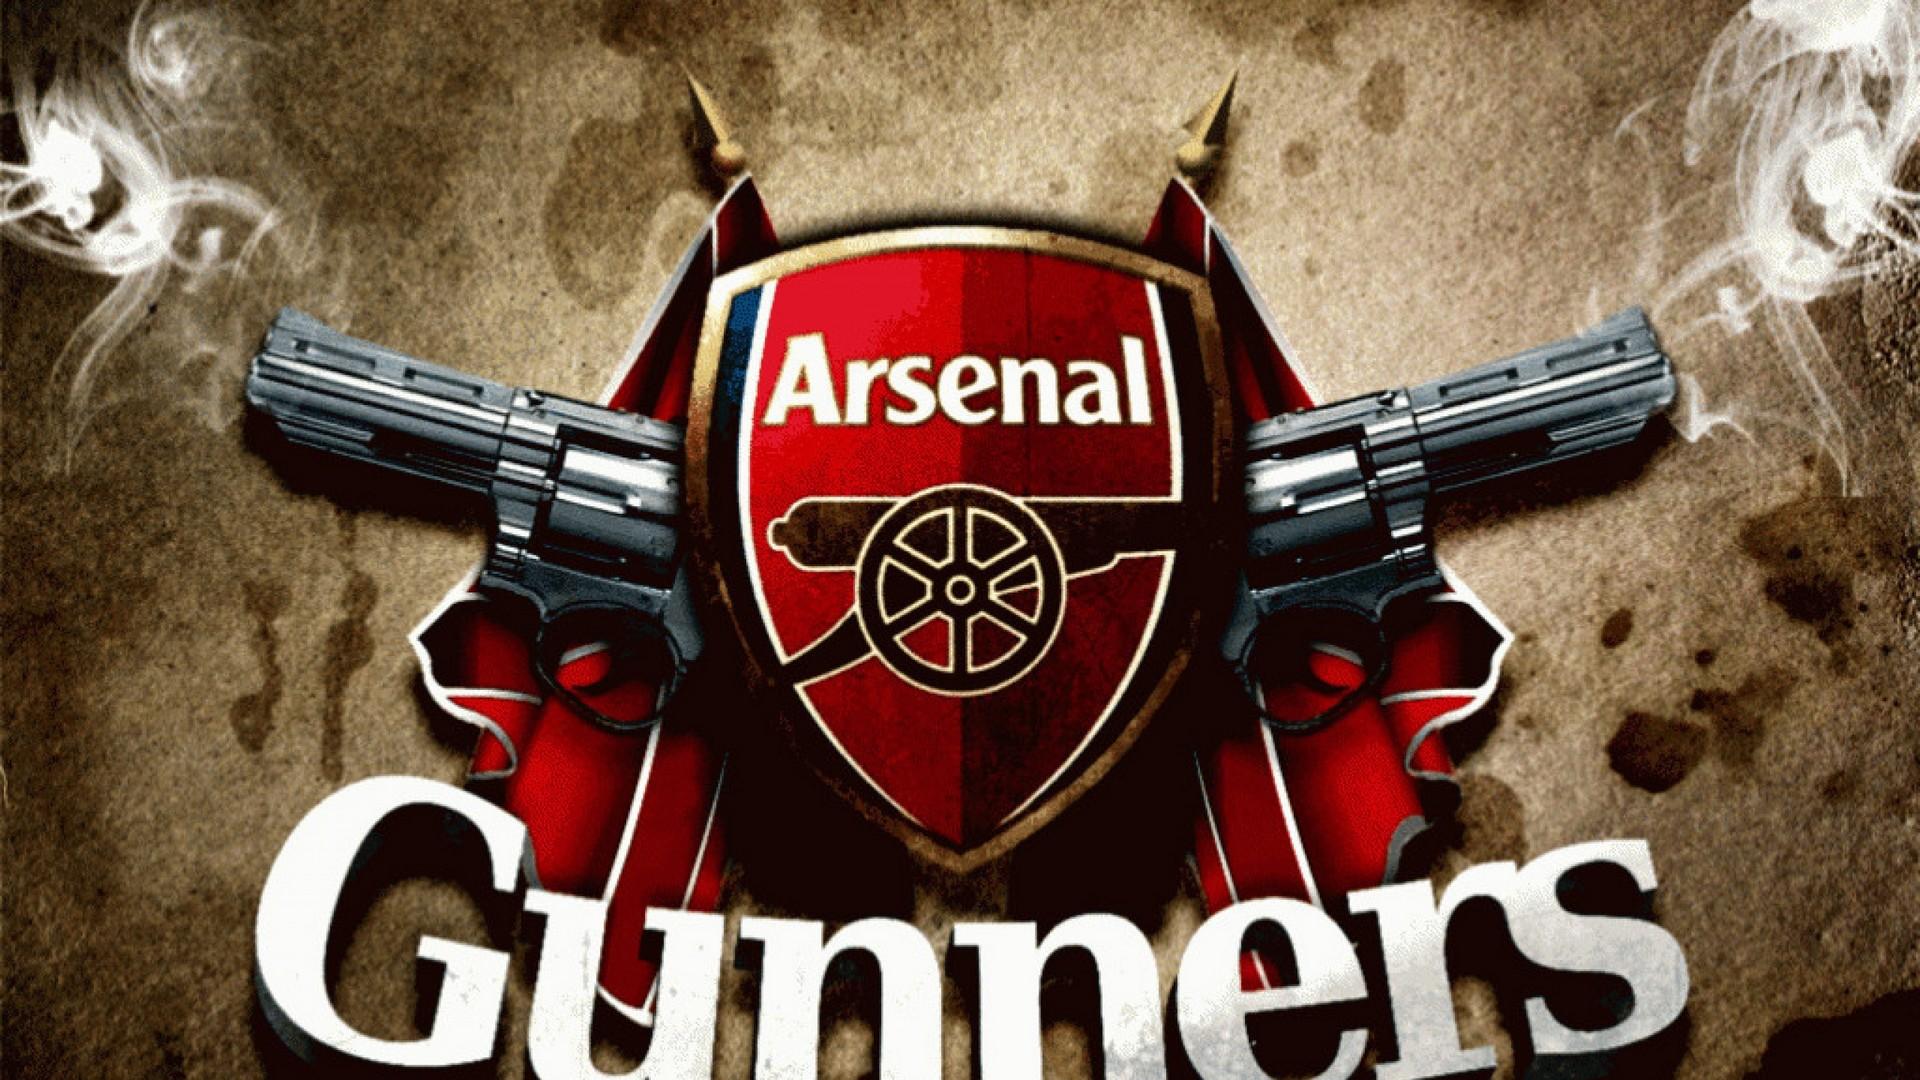 Arsenal Iphone Wallpaper Hd Hd Arsenal Wallpaper Gunners 2018 Wallpapers Hd